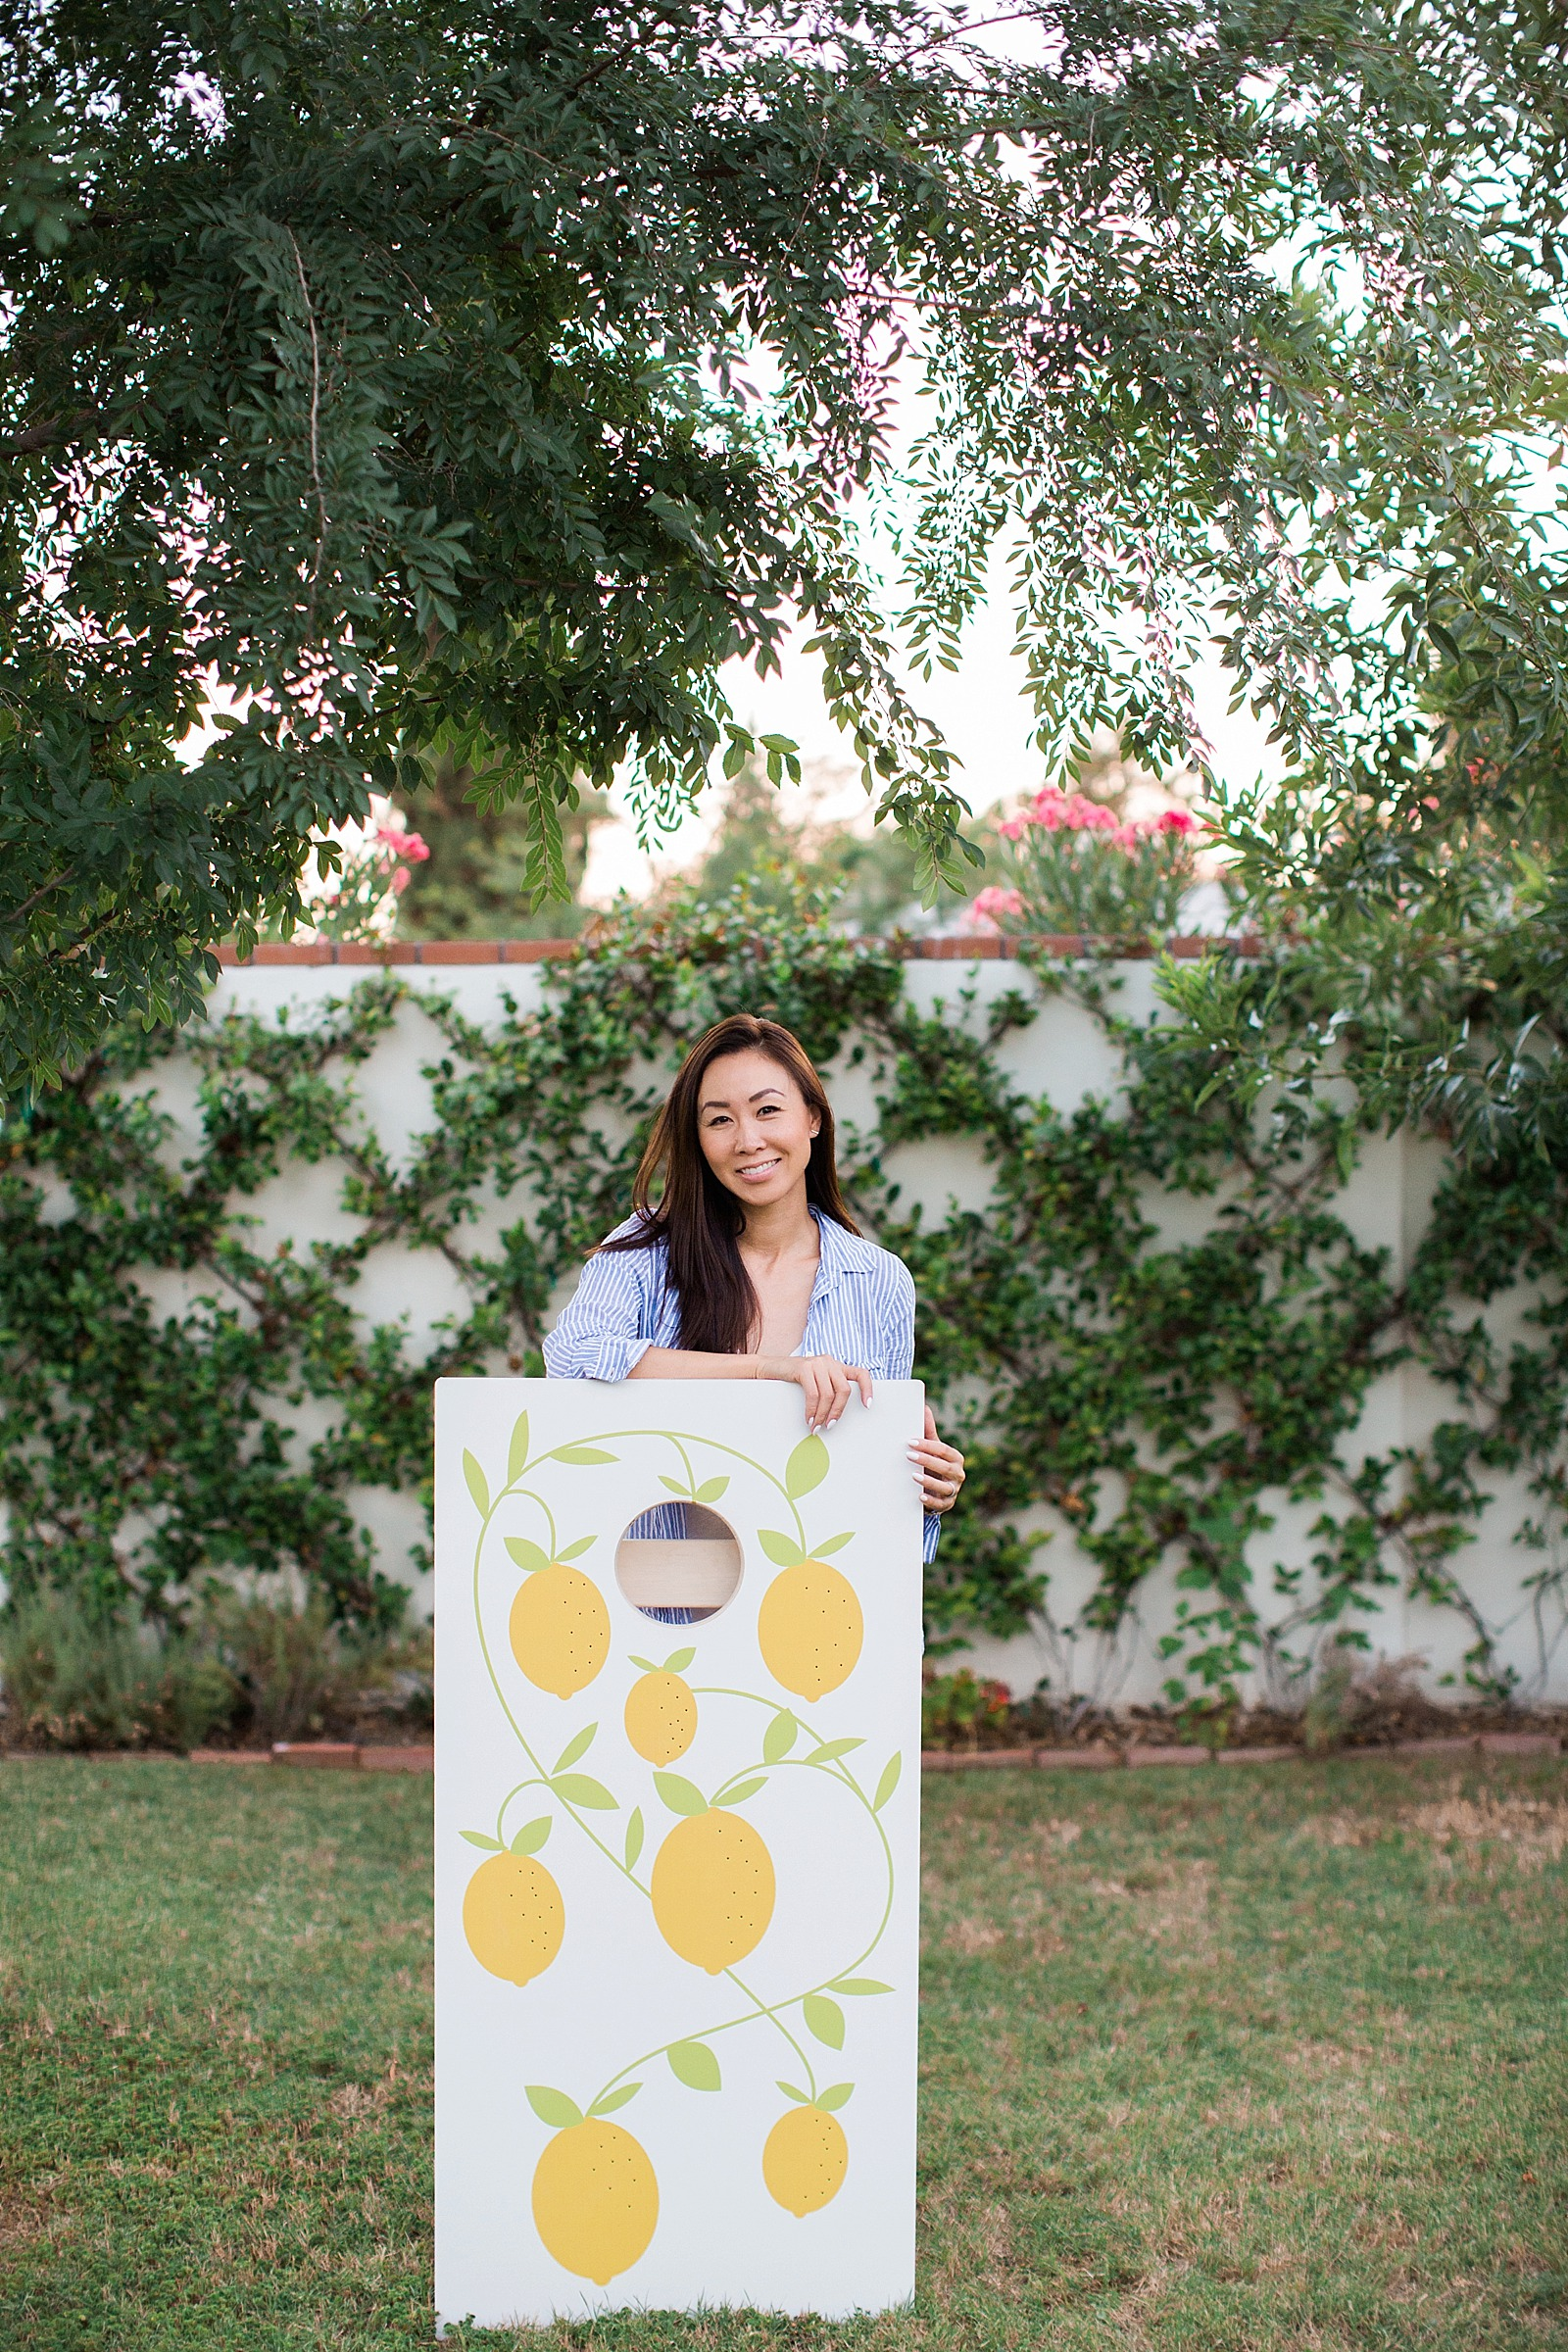 diana-elizabeth-steffen-phoenix-blogger-backyard-games-tosso-com-corn-hole-cornhole-citrus-theme_0100